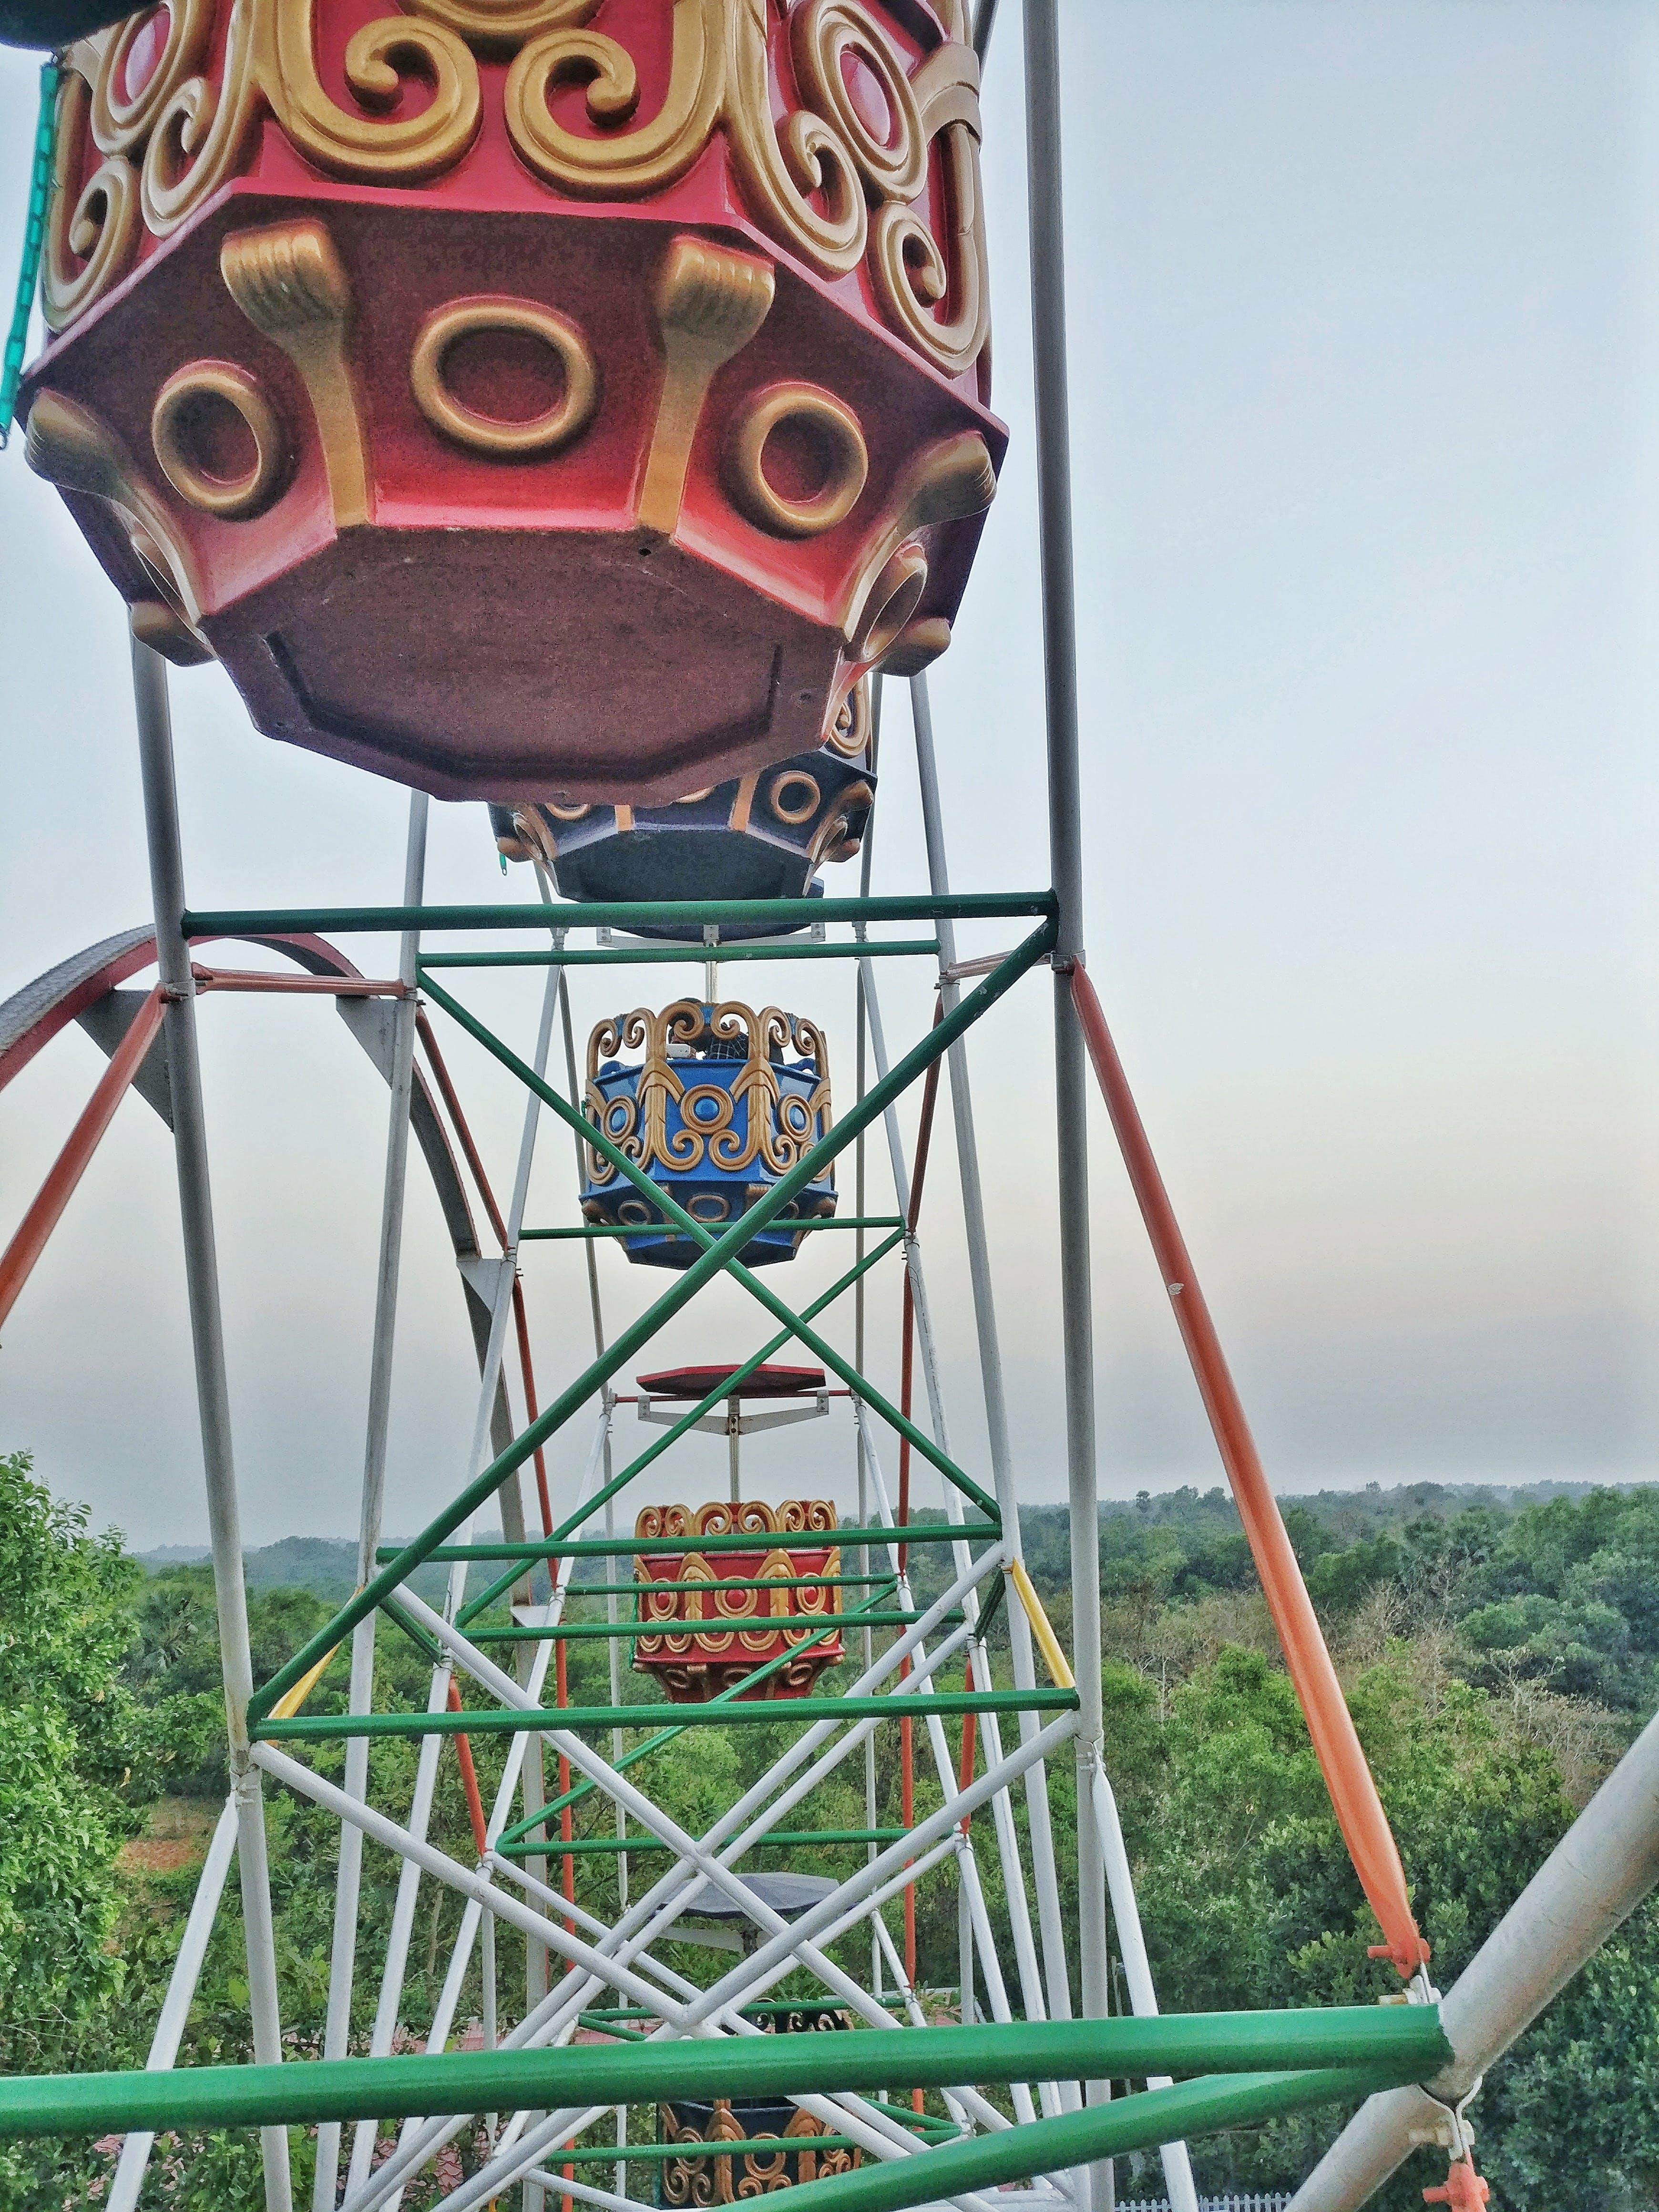 Free stock photo of amaze park, children park, marry go round, rounding wheel